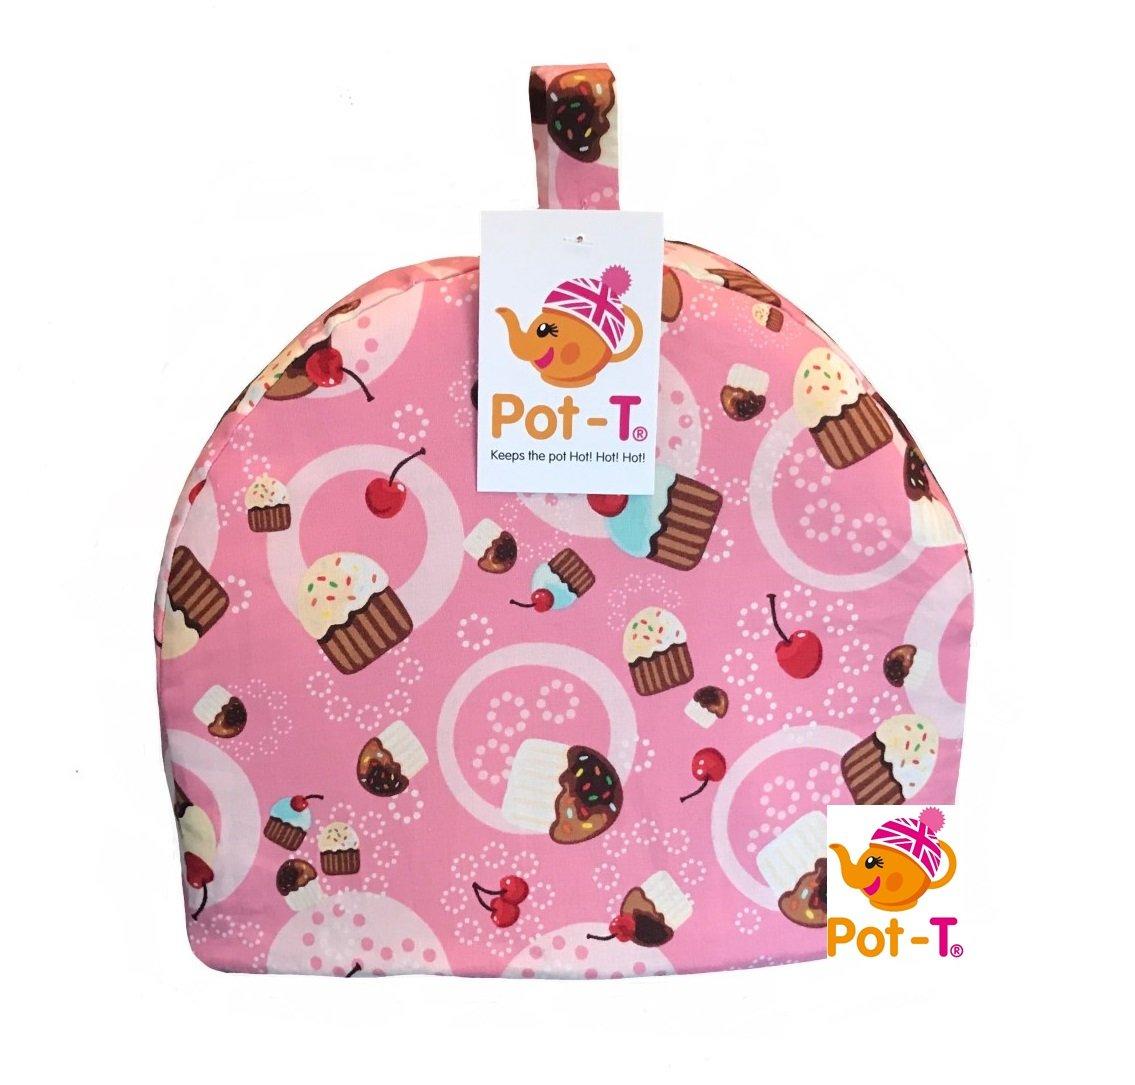 Pot-T® INSULATED Tea Cosy Cozy in Pink Cupcakes (Mini 16.5cm(h) x 8.5cm(d) x 20cm(l)) Coolcozycovers LTD